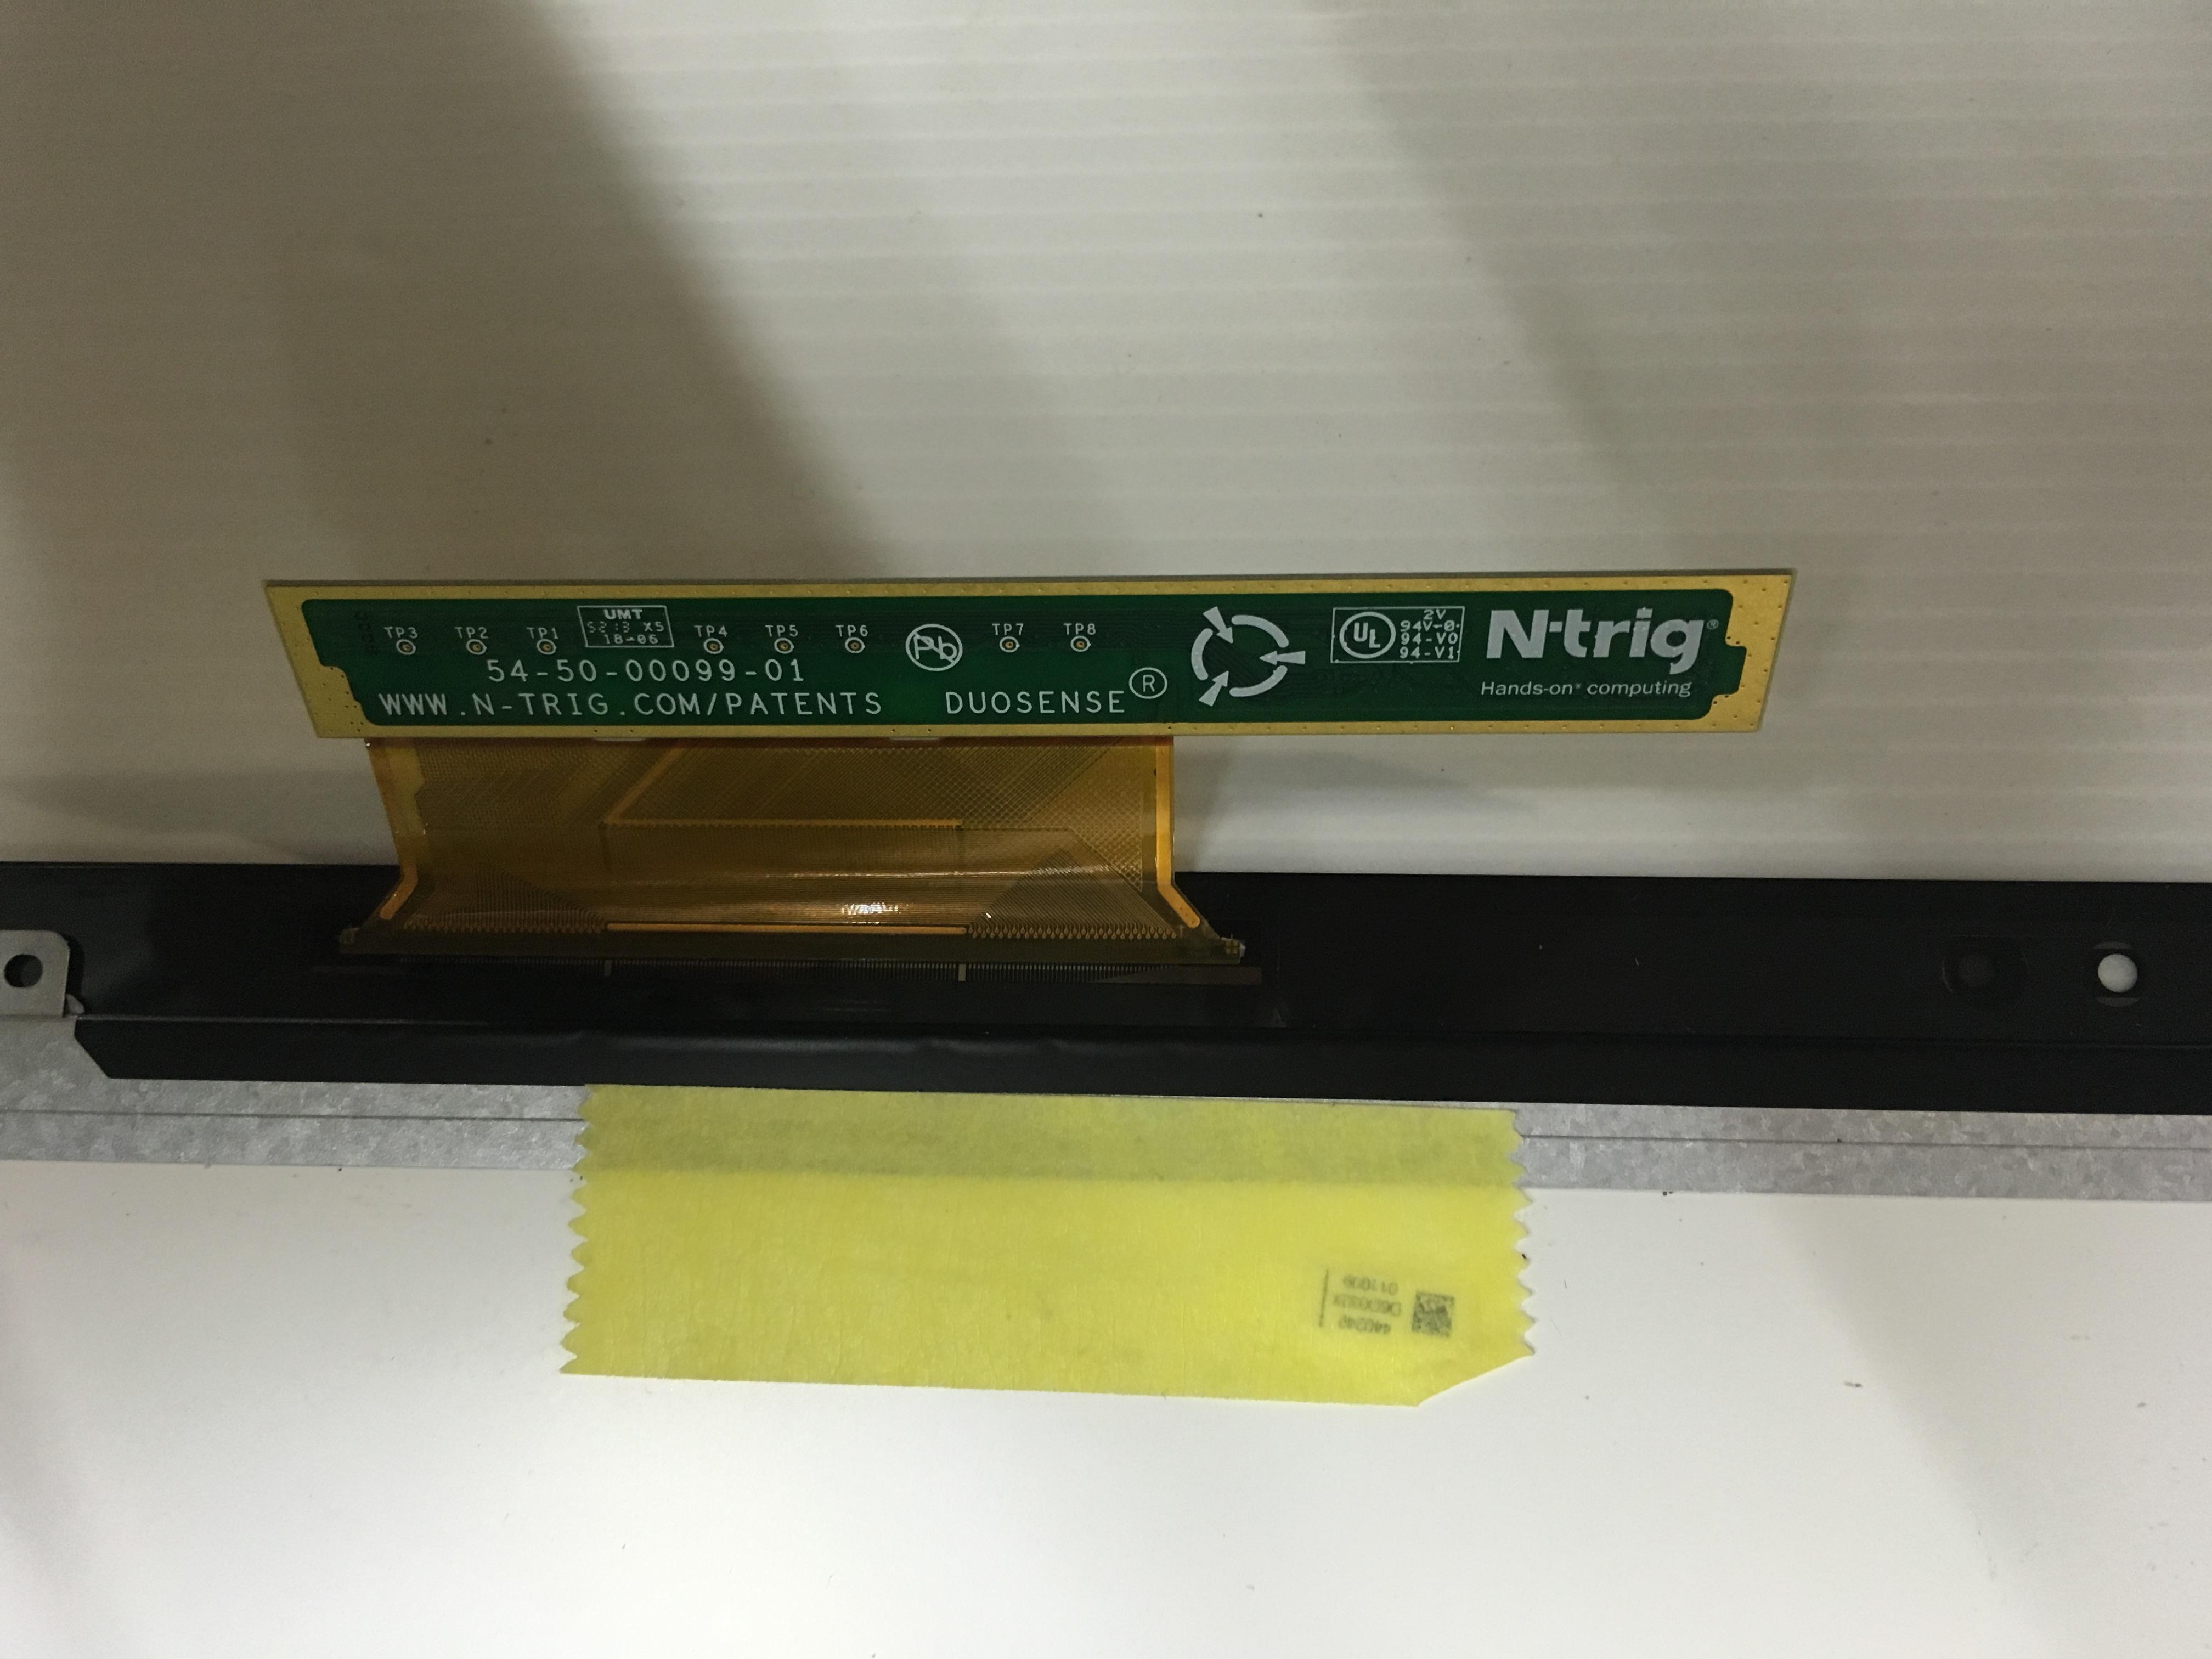 original para Sony Vaio serie SVF15N portátil pantalla LED con panel de pantalla táctil LP156WF4 SPU1 SPXU1 54-50-00099-01 NC155WSL01